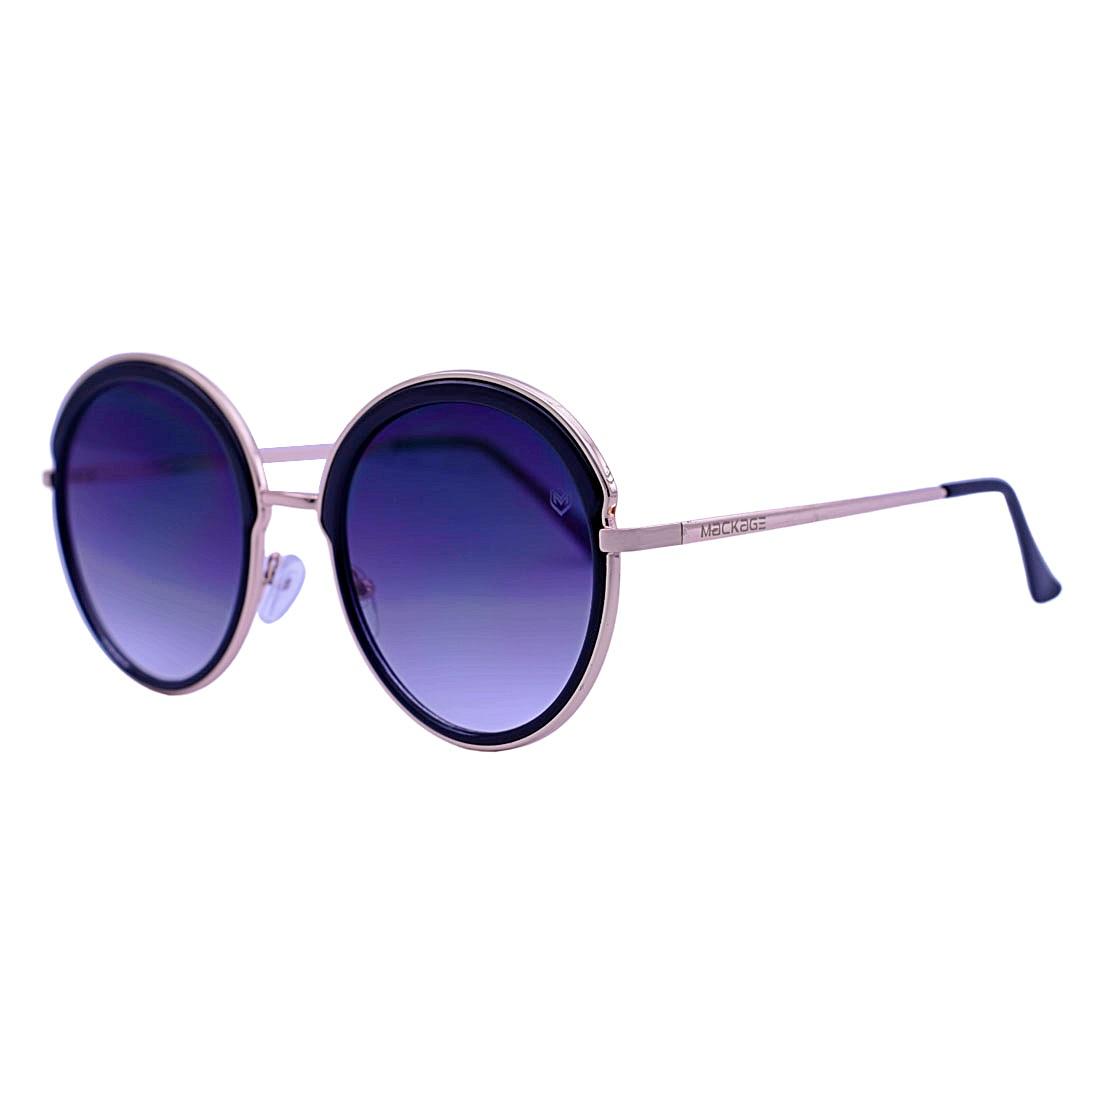 Óculos De Sol Mackage Feminino Metal Oversize Redondo - Dourado/Preto